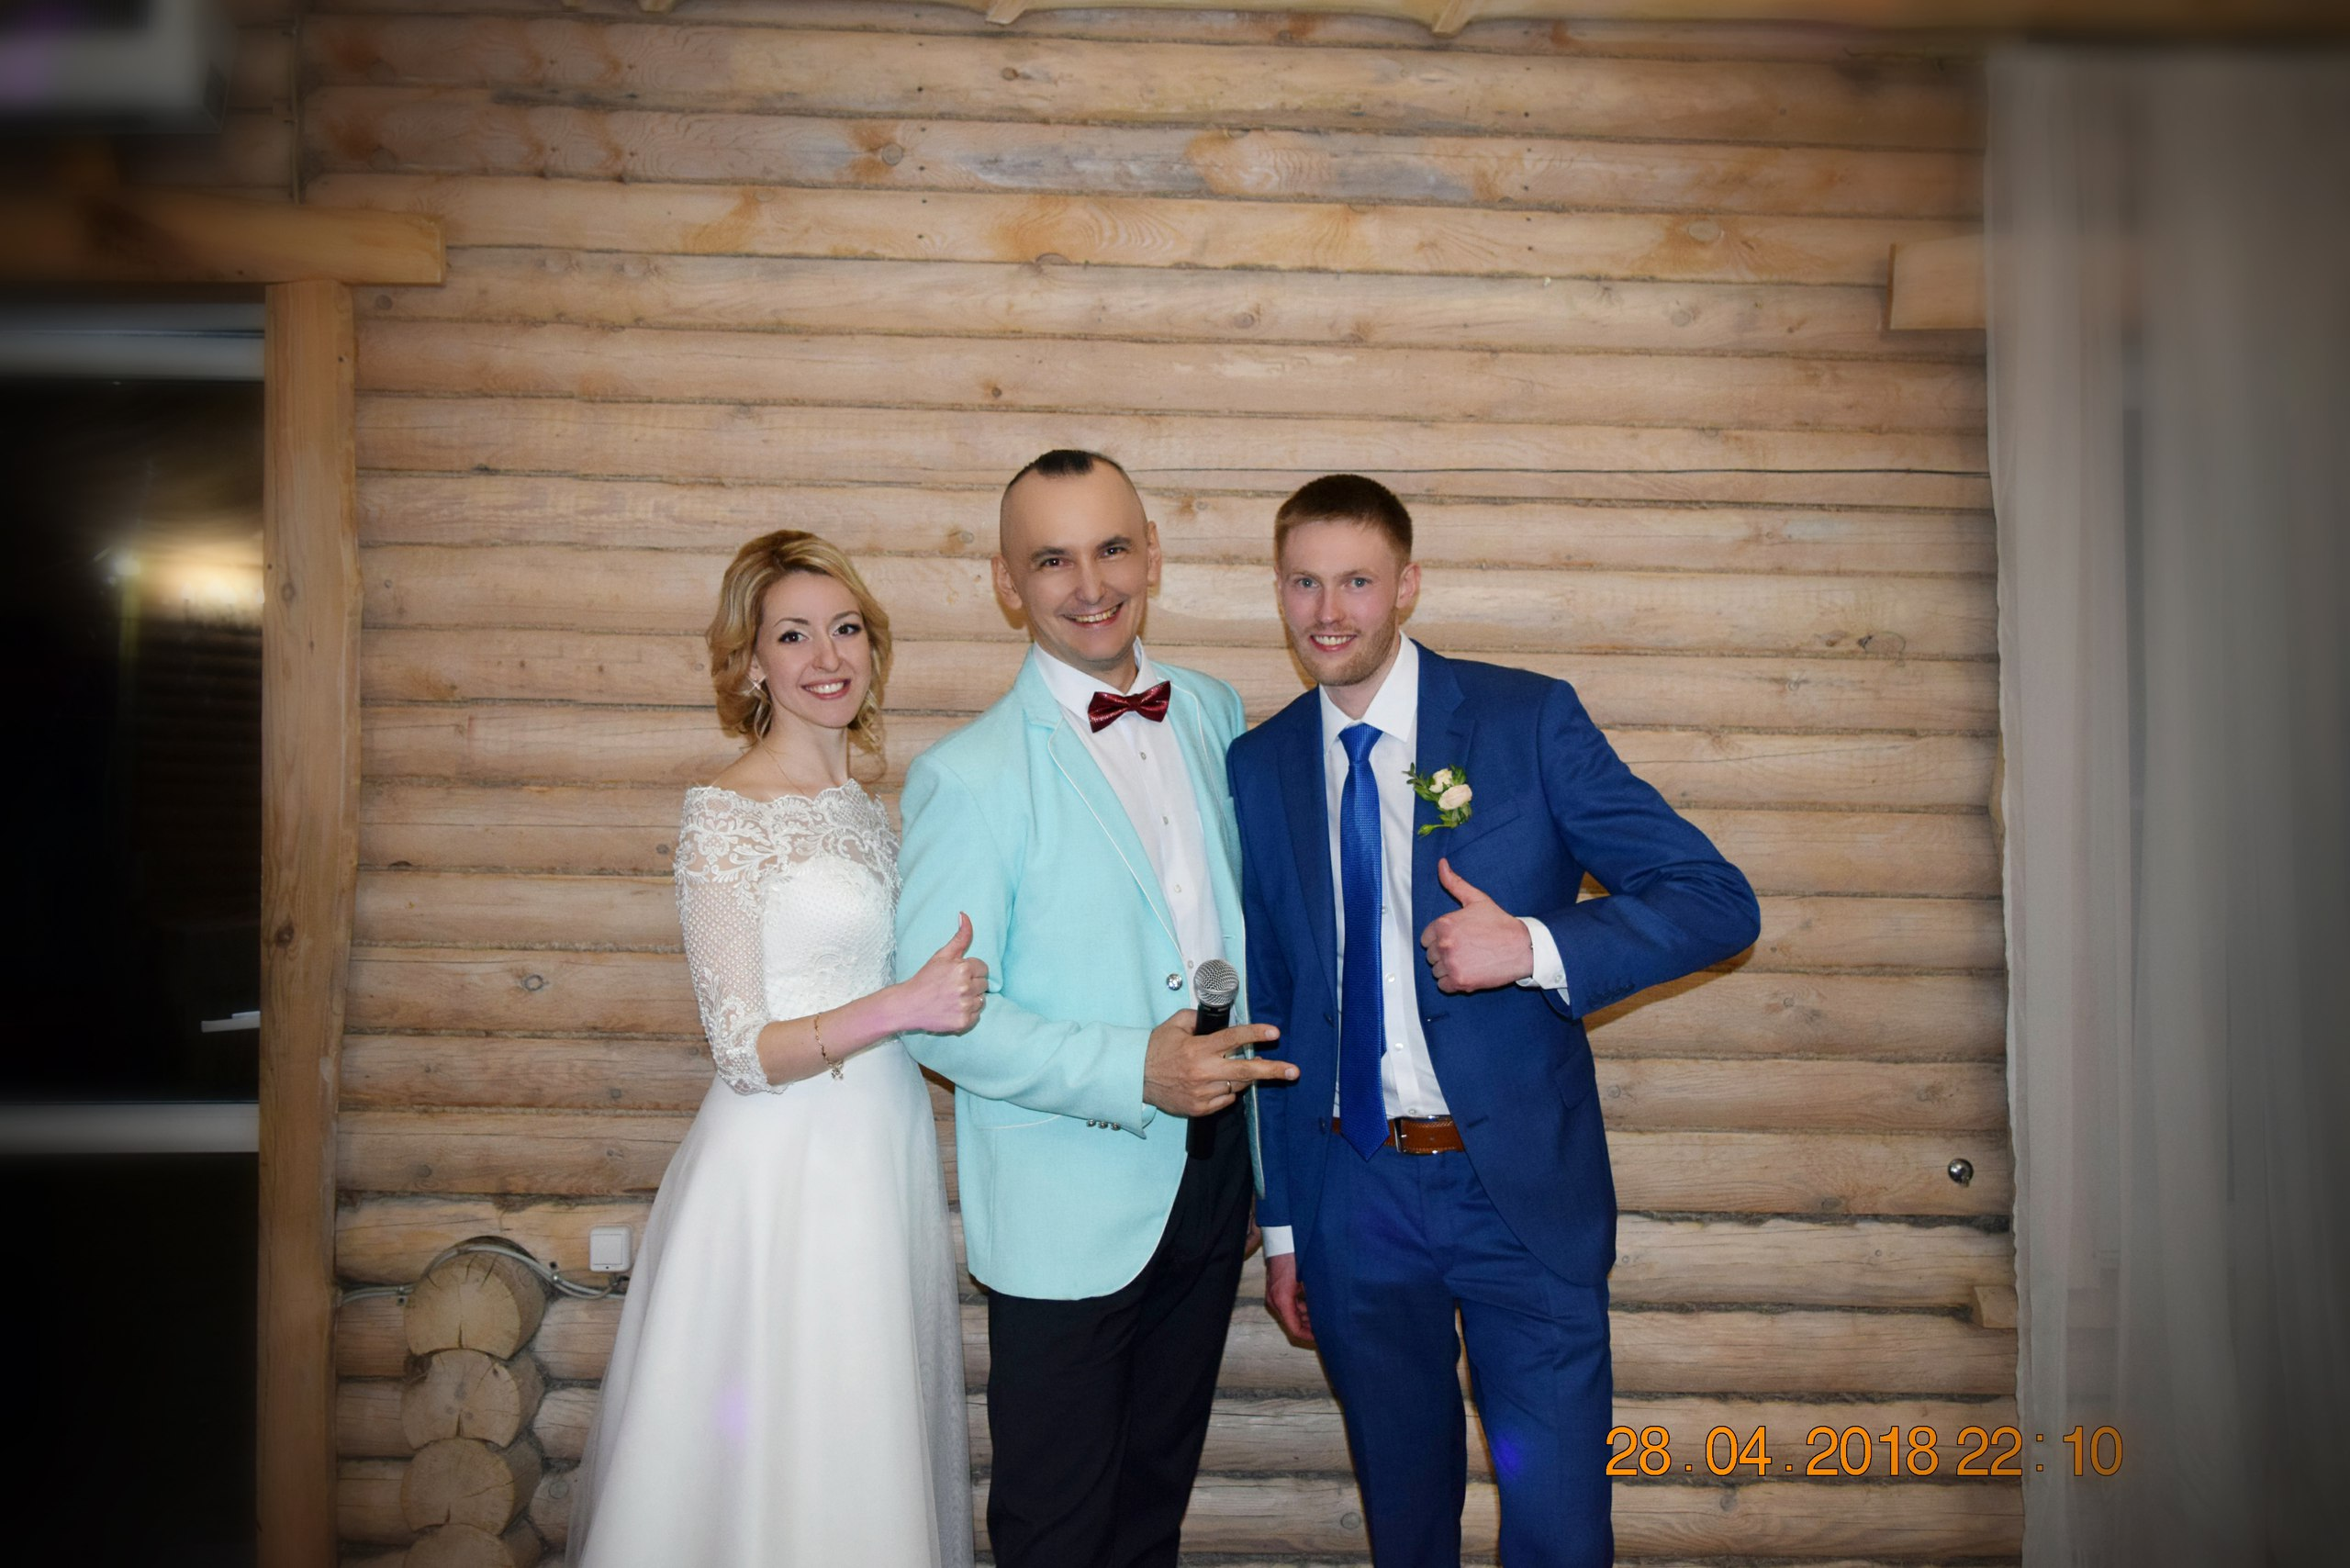 IqjyFRvakaU - Свадьба Данила и Алины